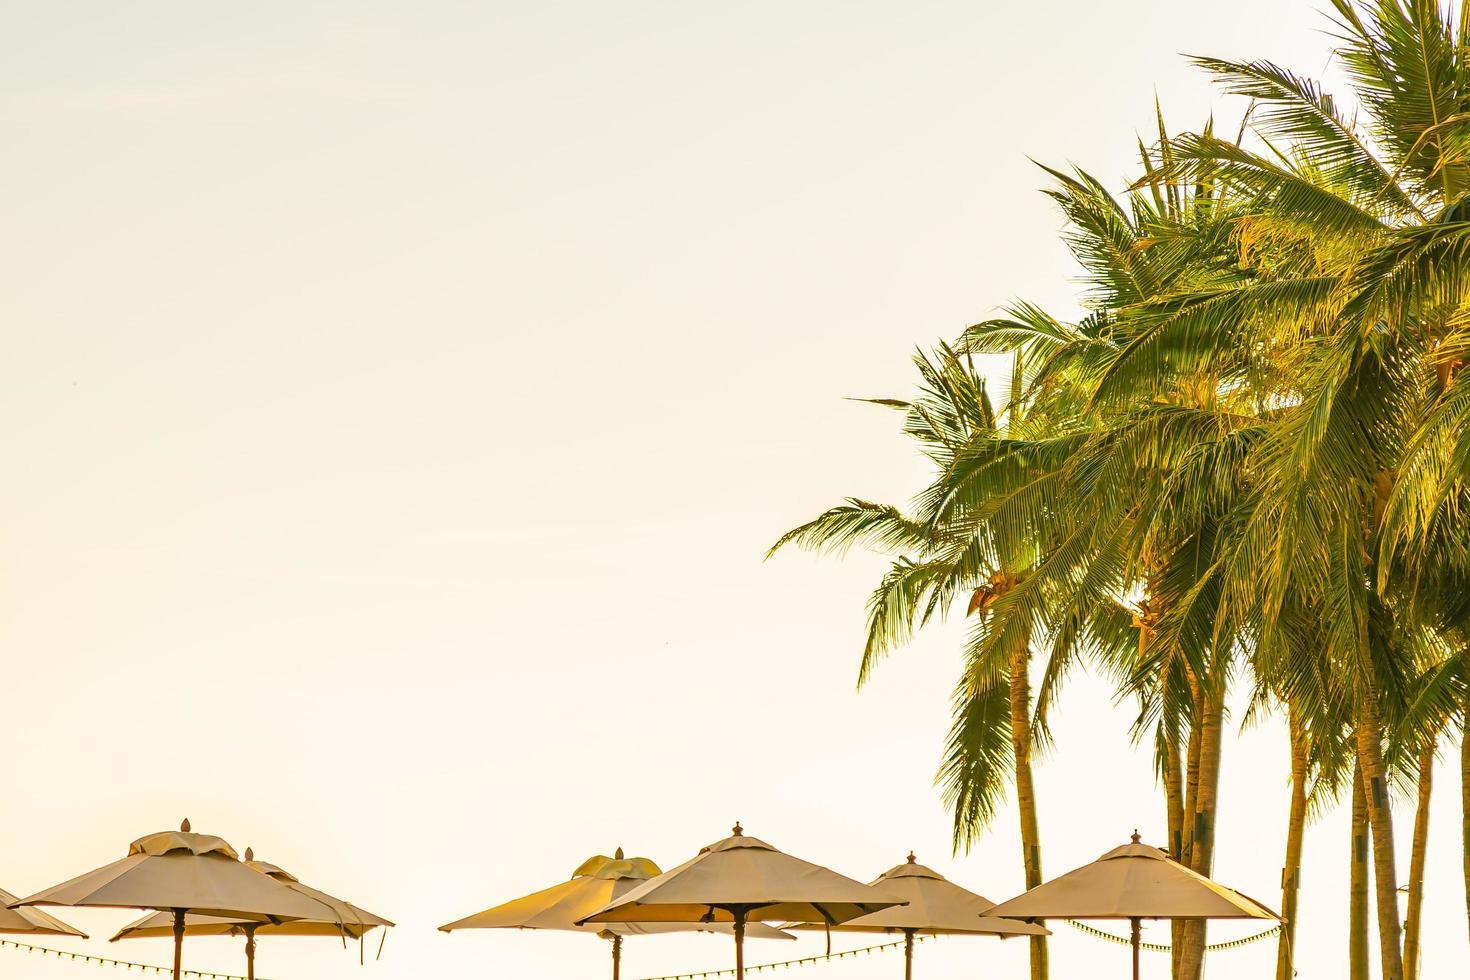 Beautiful tropical nature and umbrellas photo